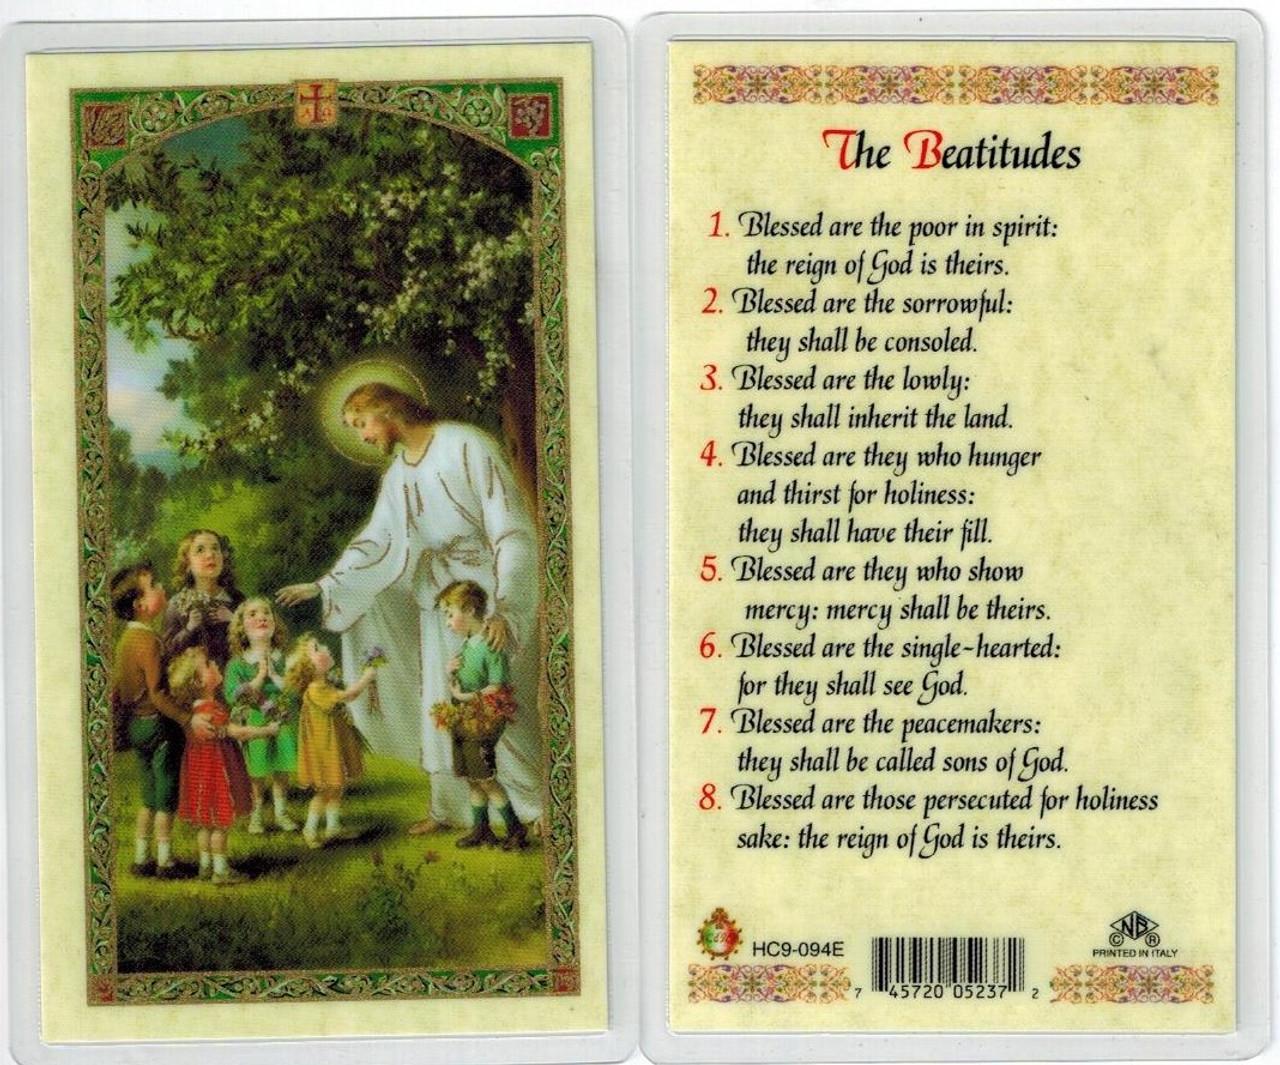 Jesus w/ children Beatitudes, Laminated prayer card